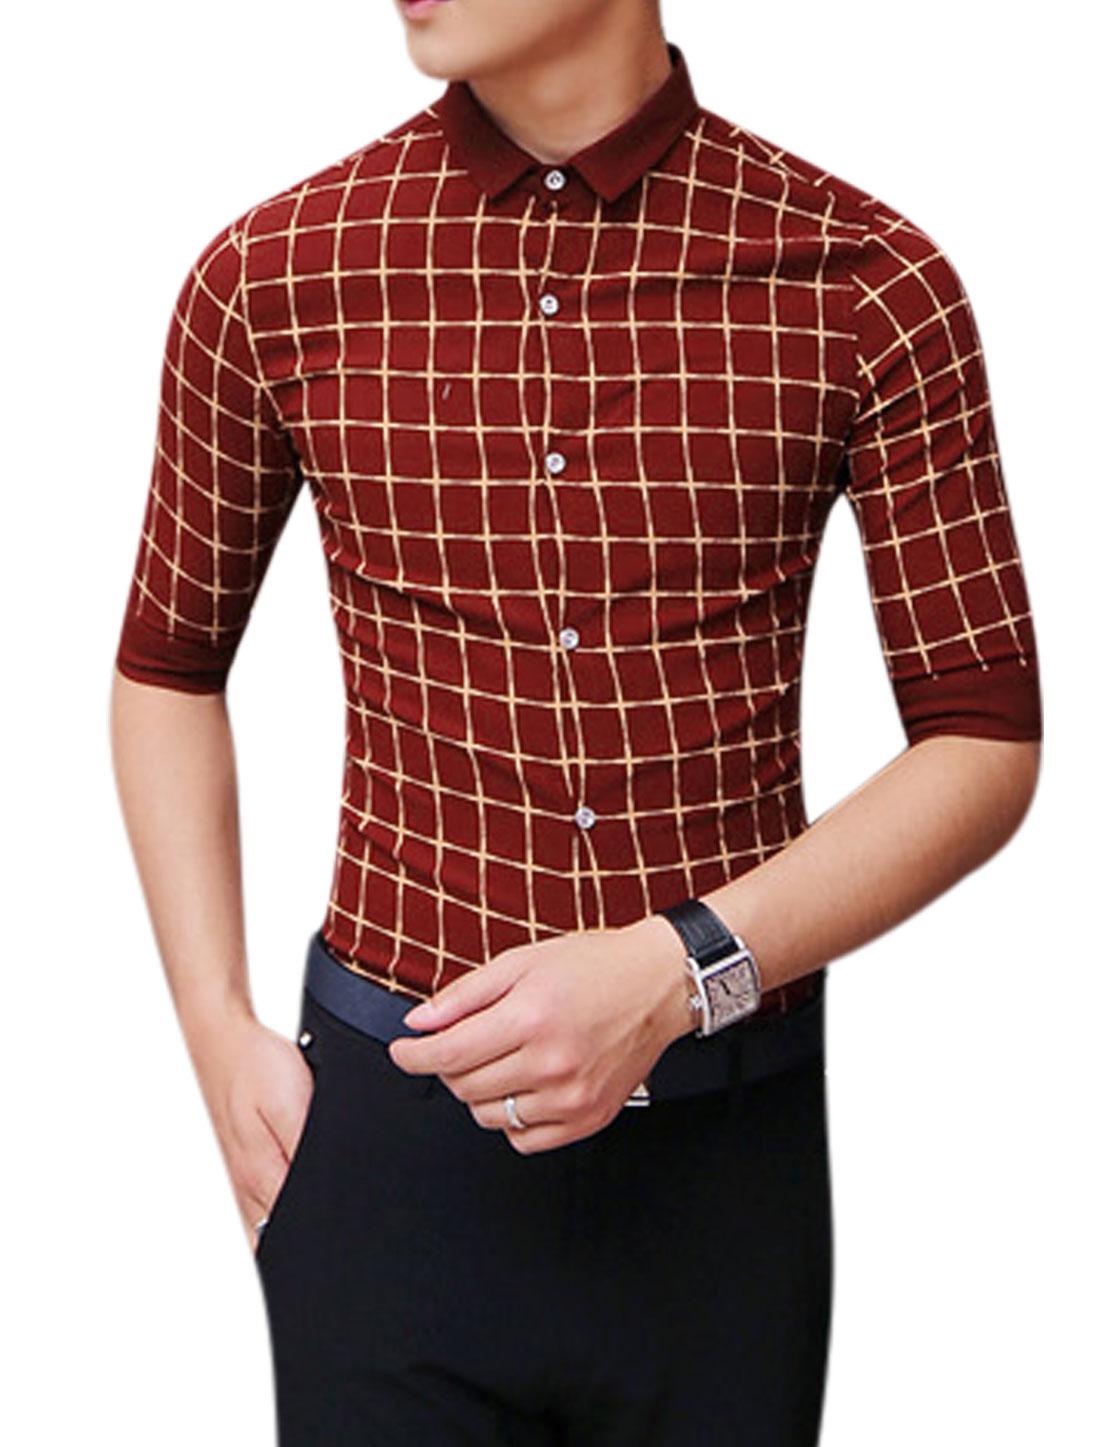 Man Elbow Sleeves Checks Button Down Shirts Burgundy S